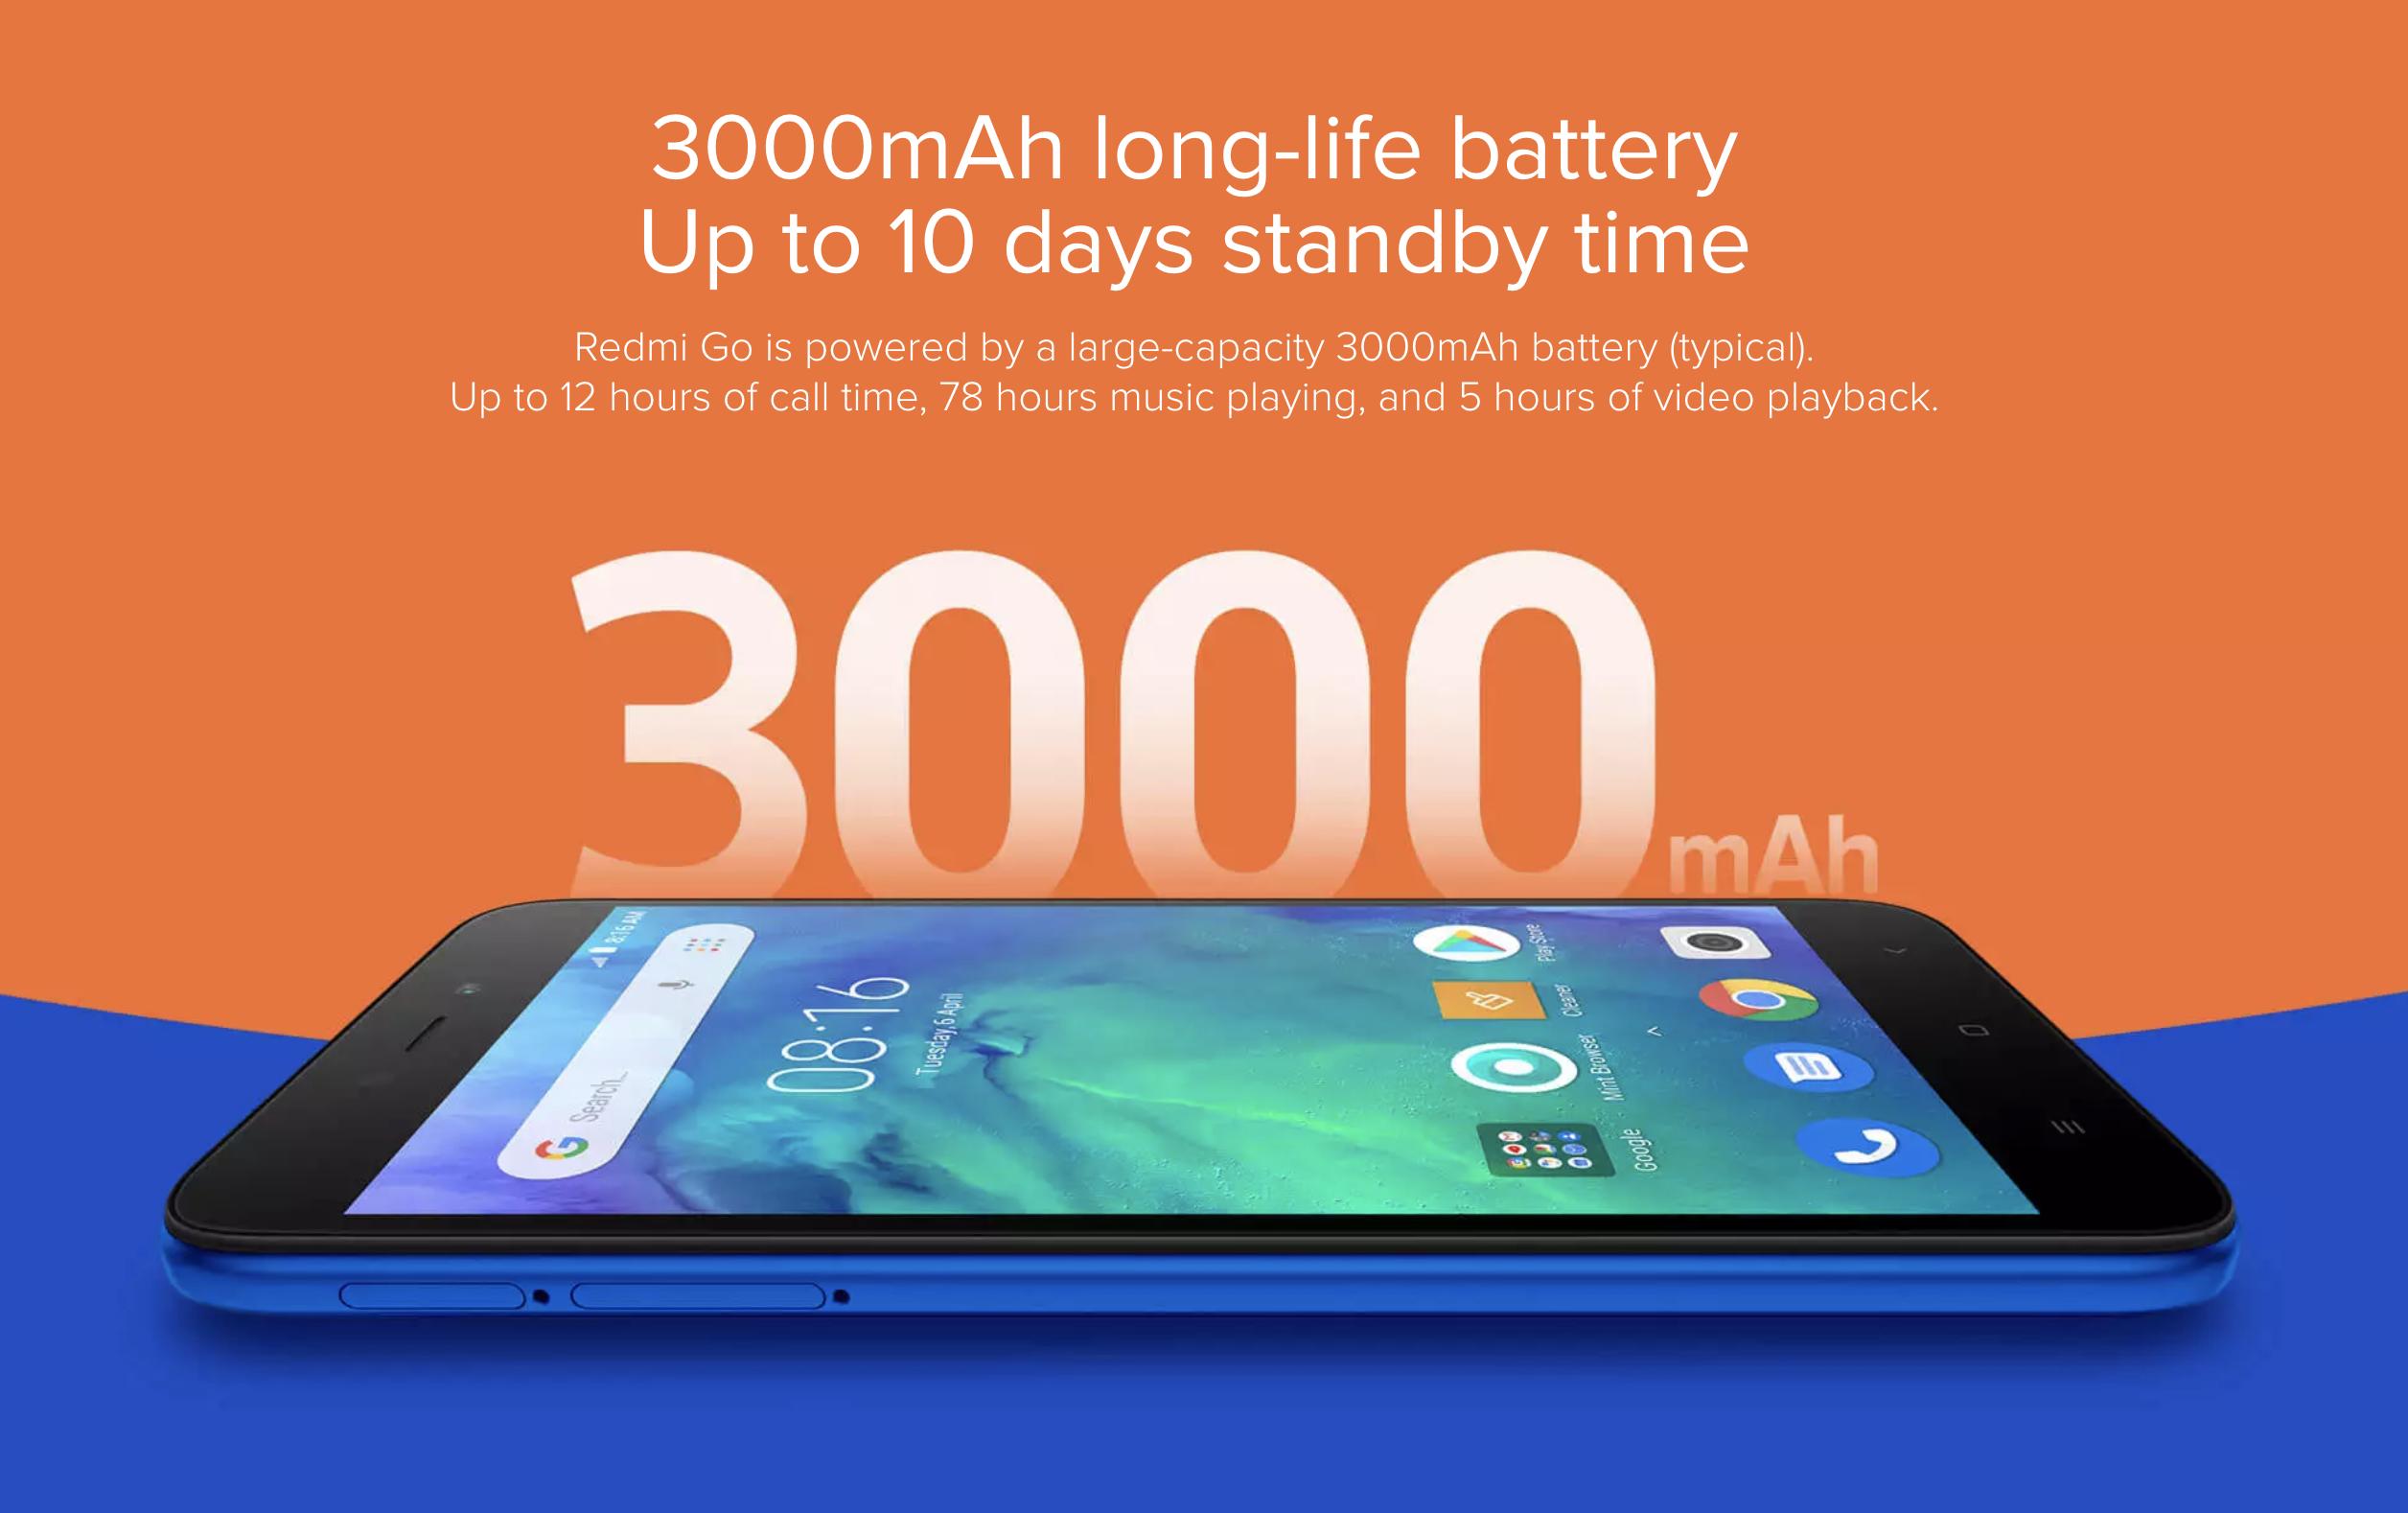 Xiaomi Redmi Goのバッテリー